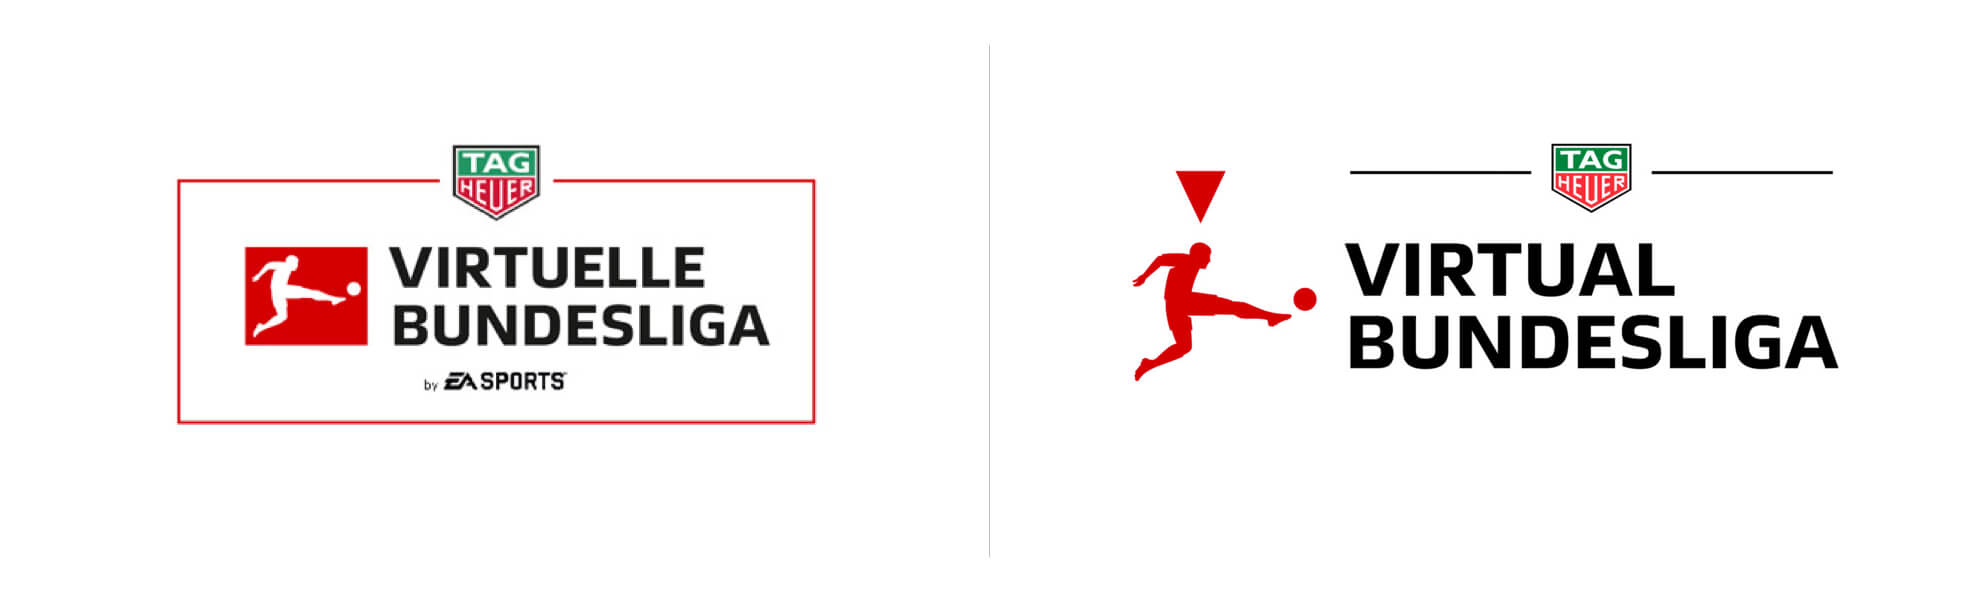 Virtual Bundesliga przeszła rebranding